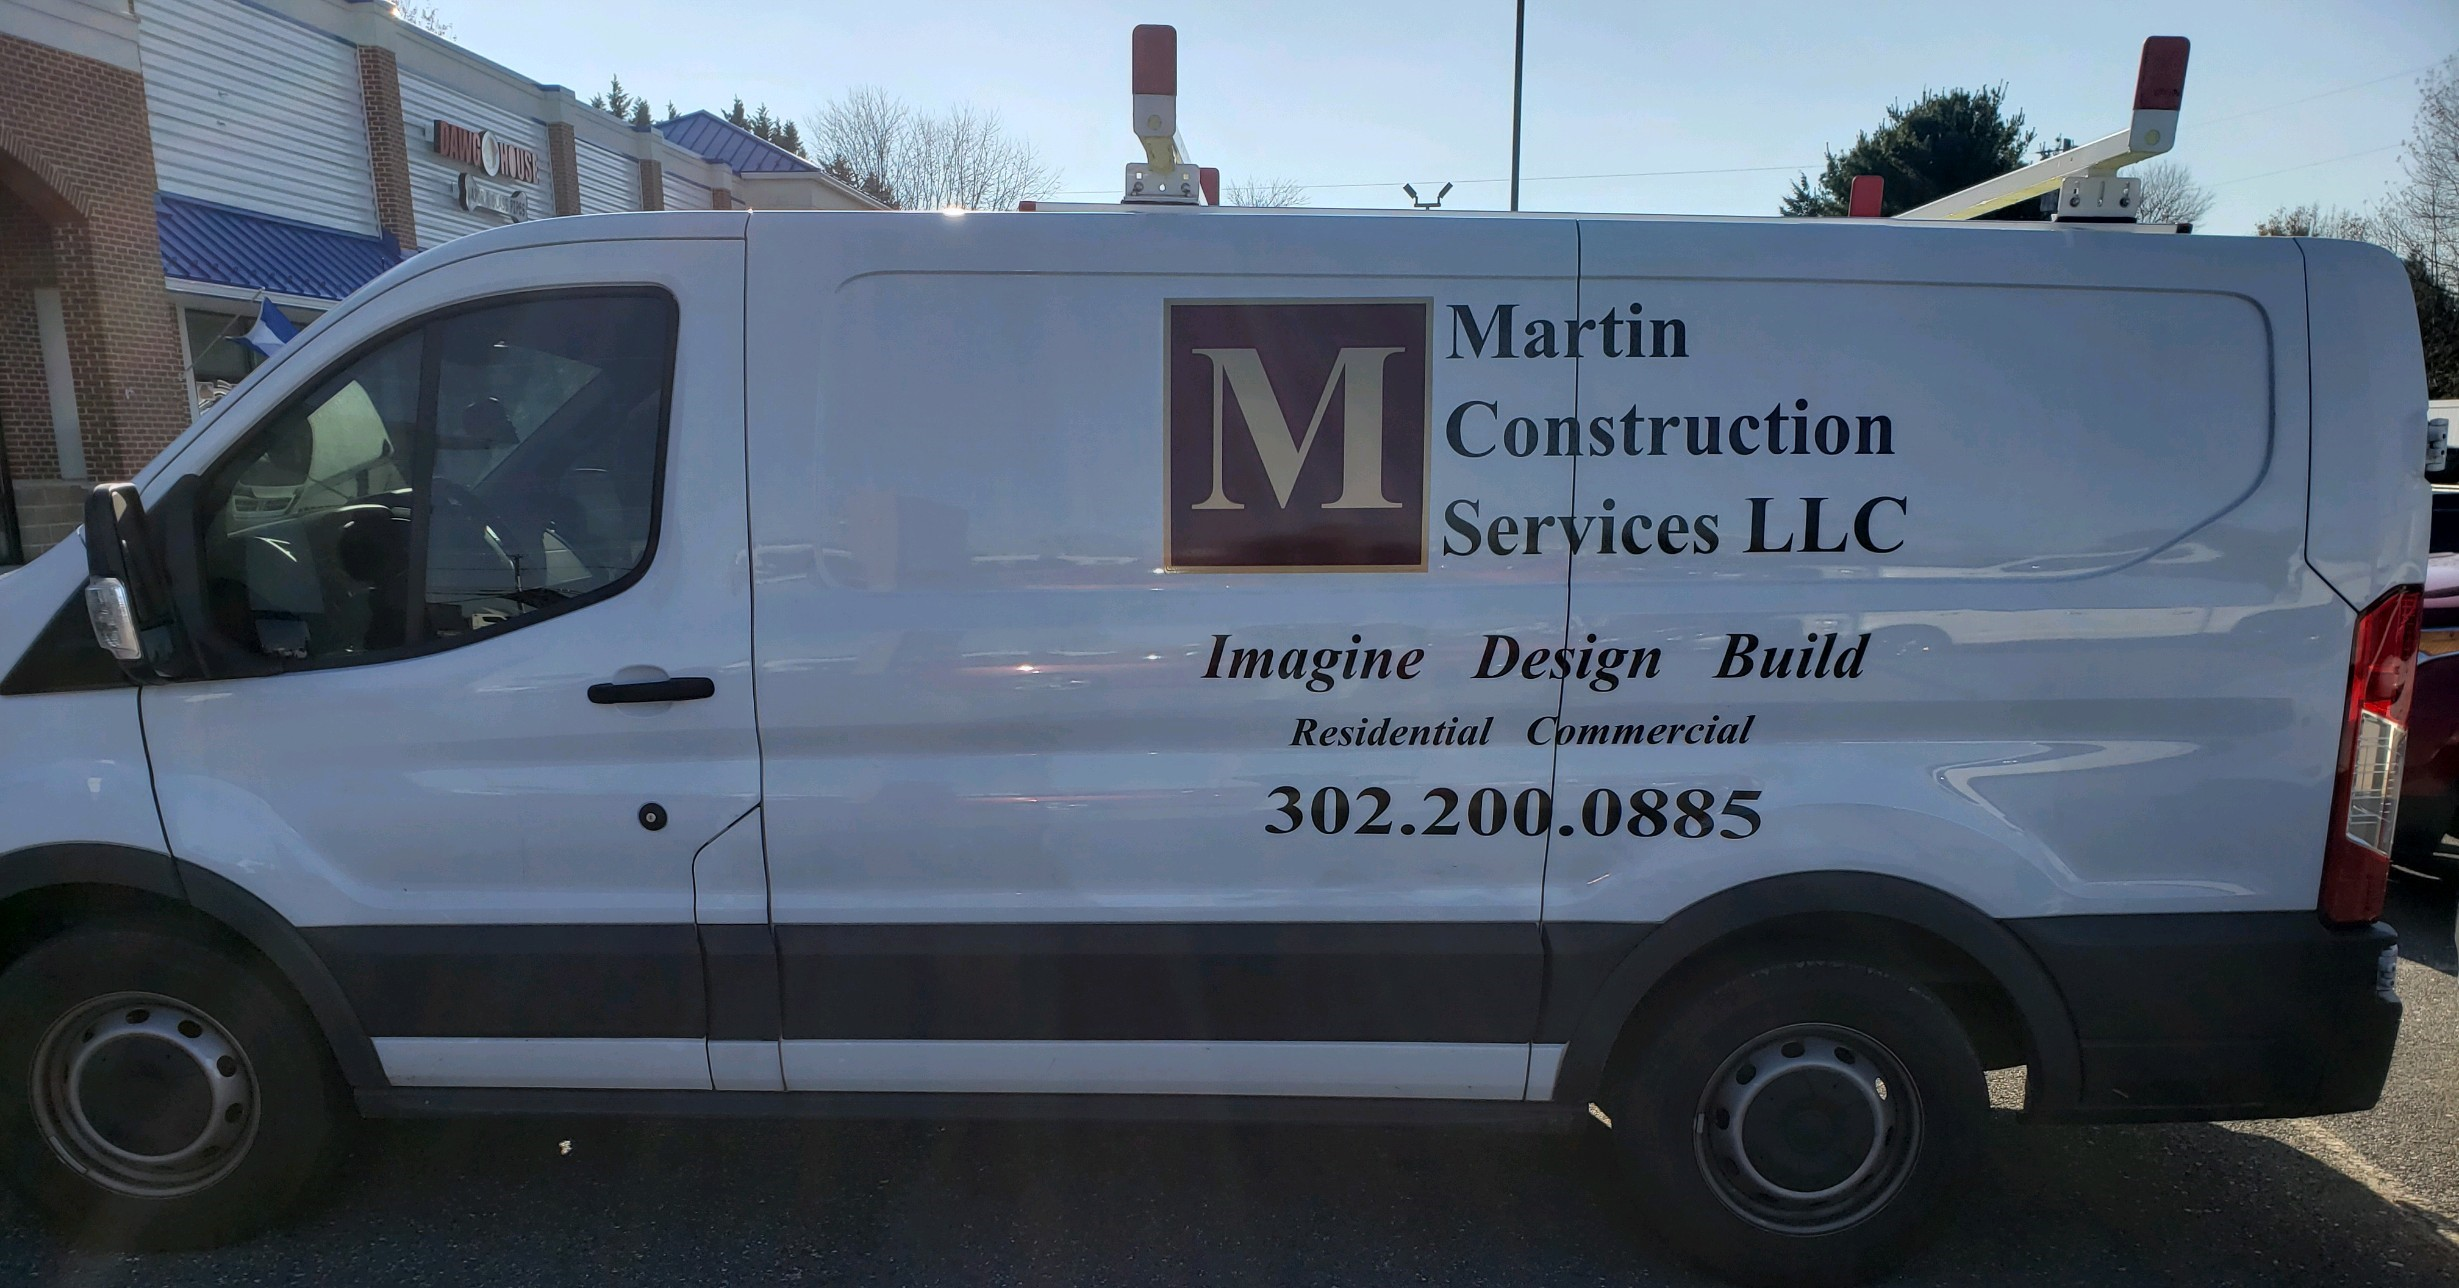 Martin Construction Services LLC logo